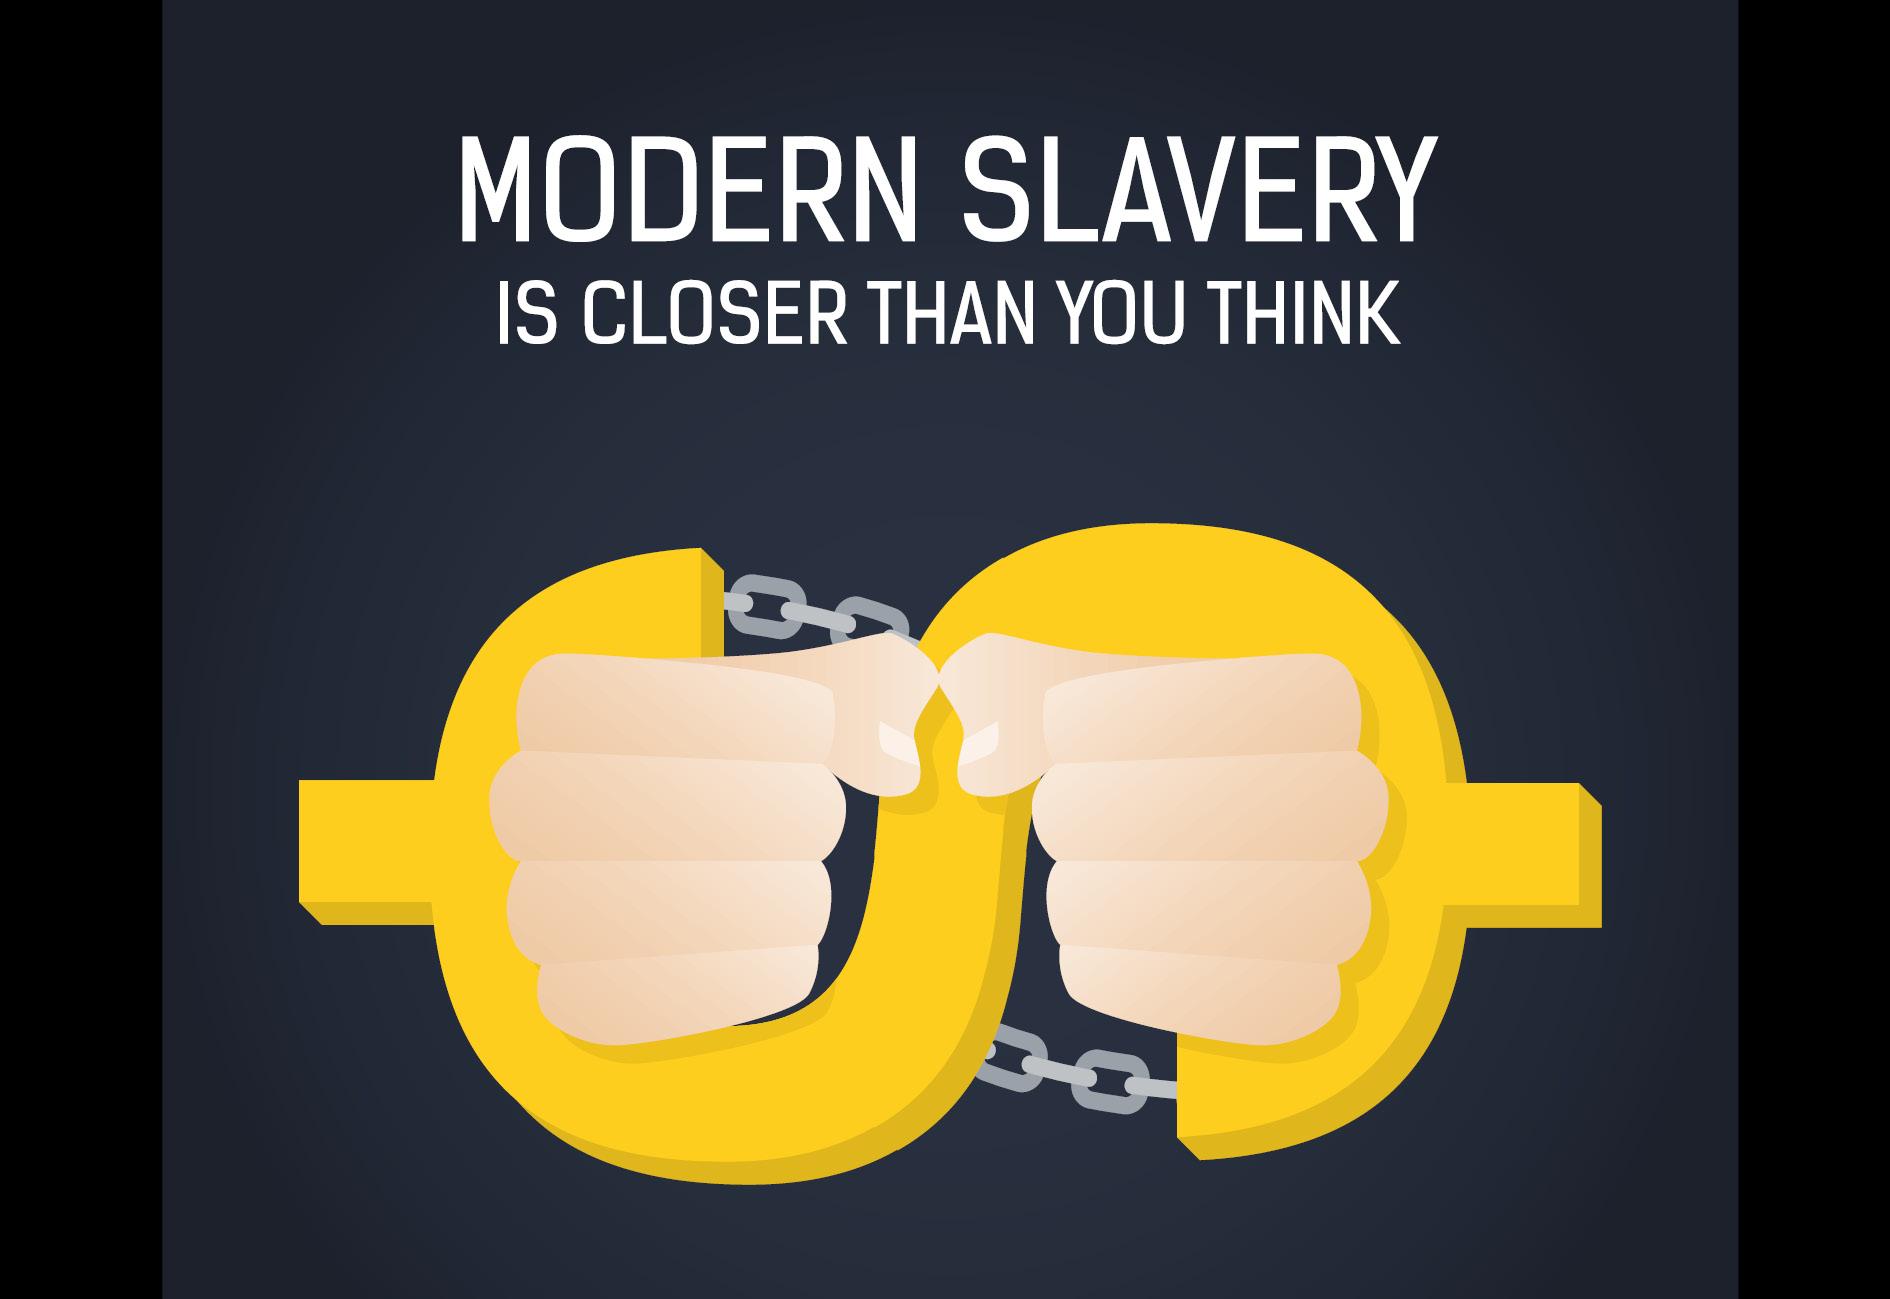 Modern slavery is closer than you think logo